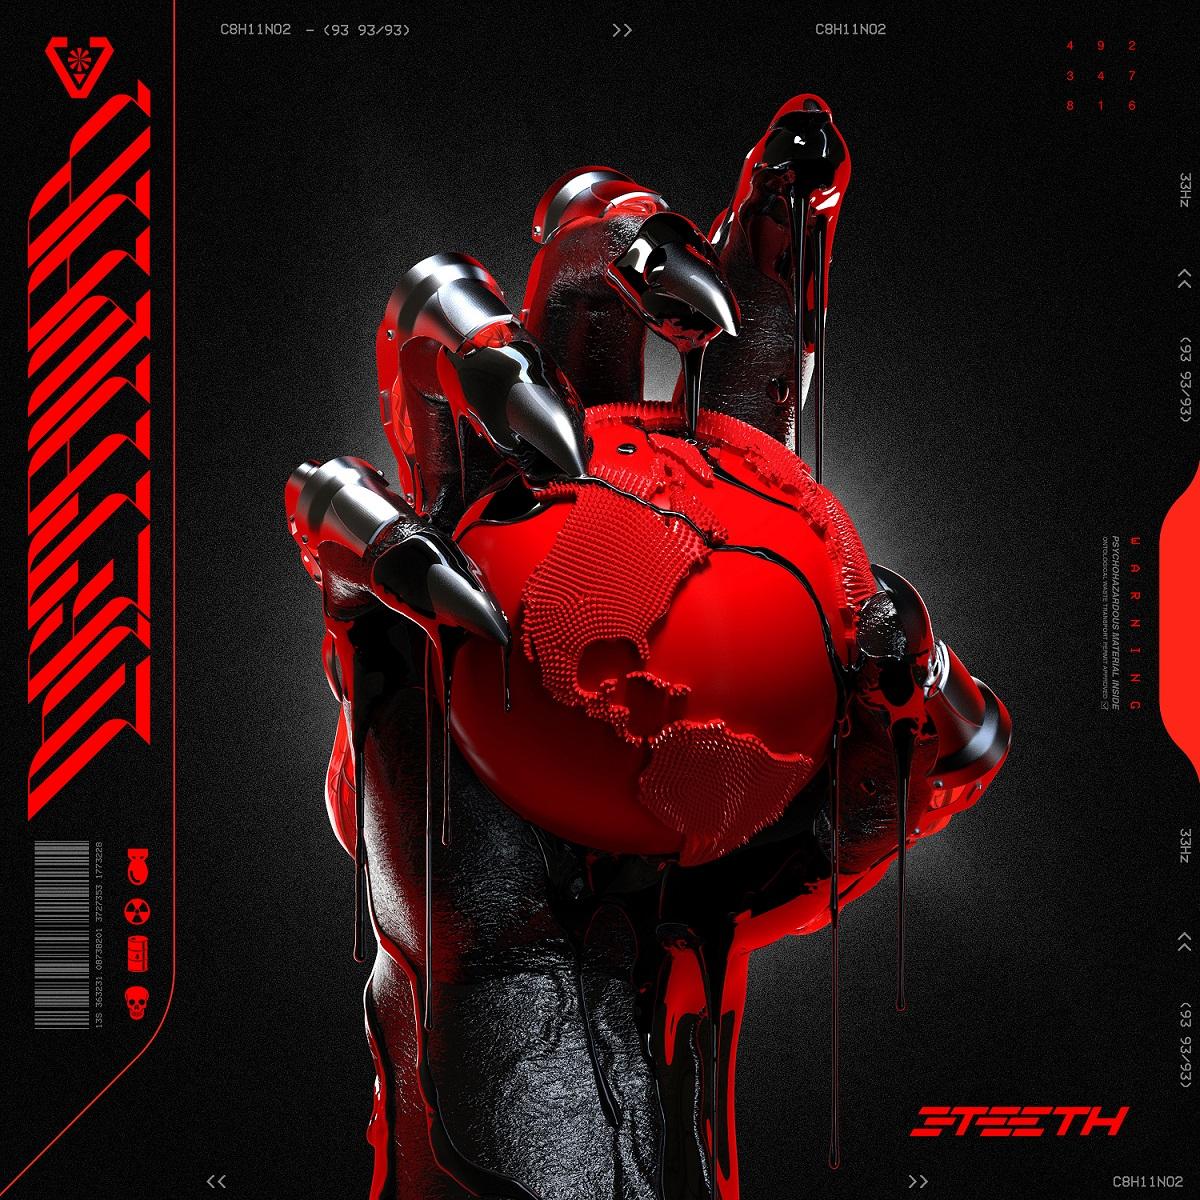 3TEETH announce new album 'Metawar' | Debut new song